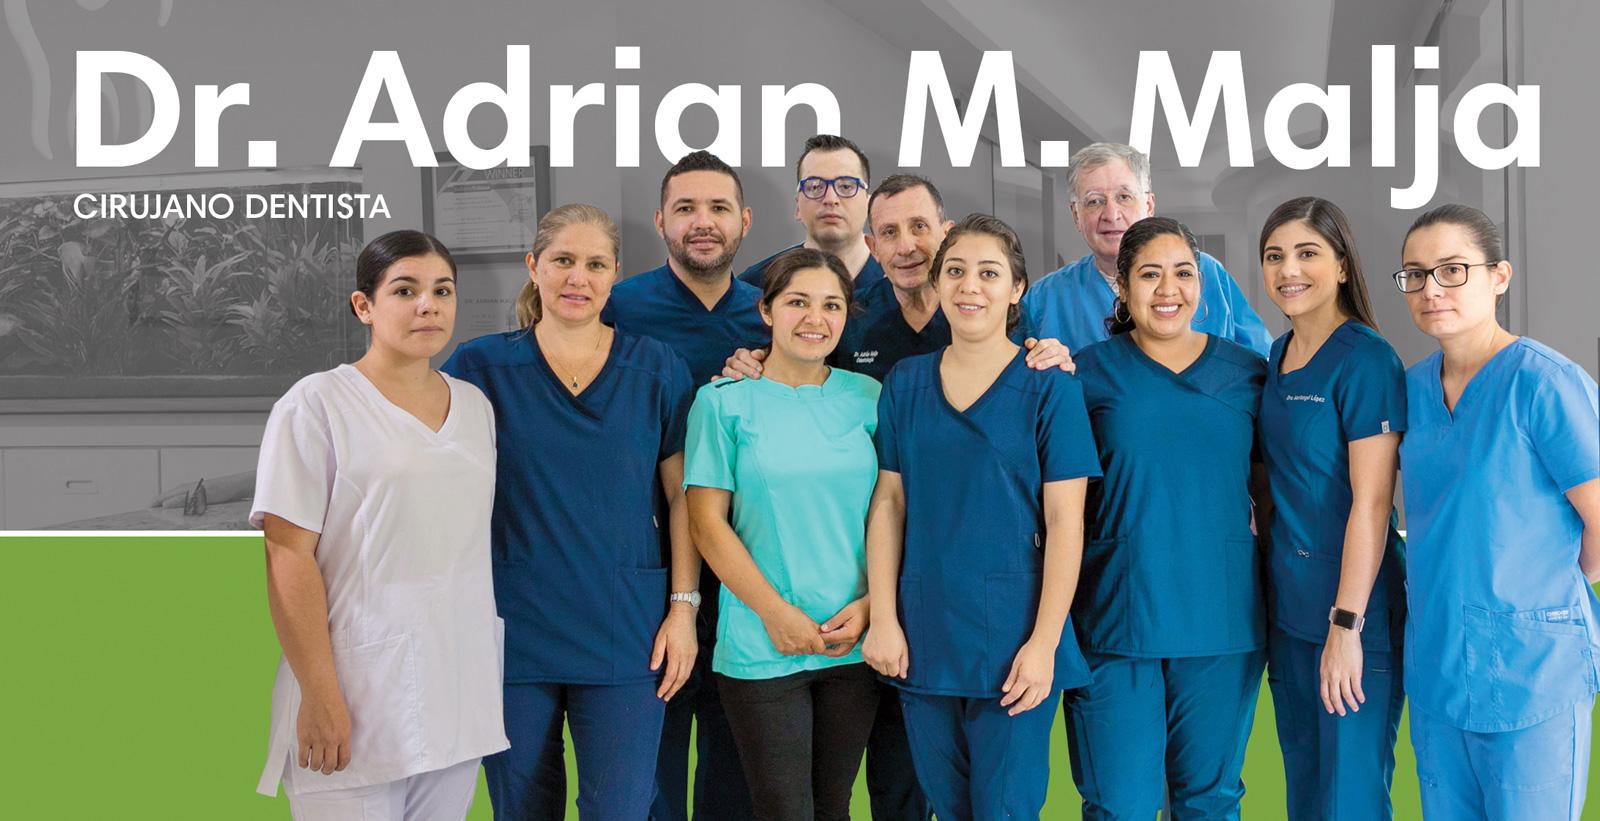 Adrian Malja dentista puerto vallarta